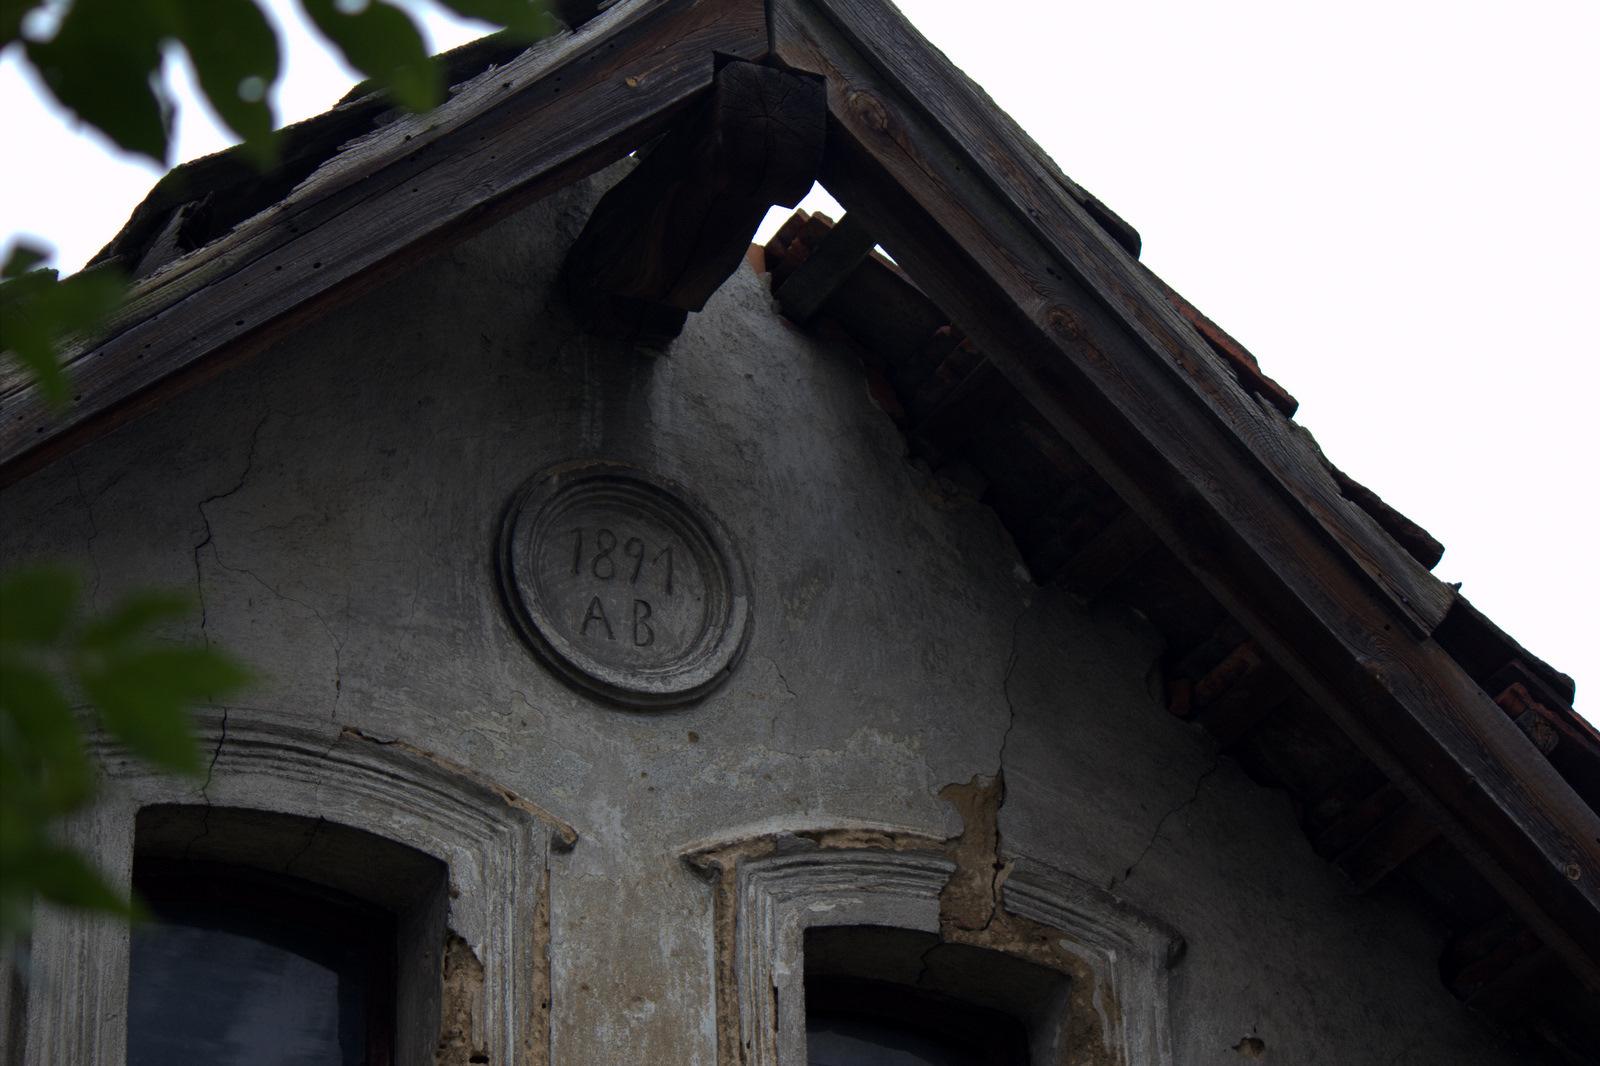 Langlieben - Das Haus